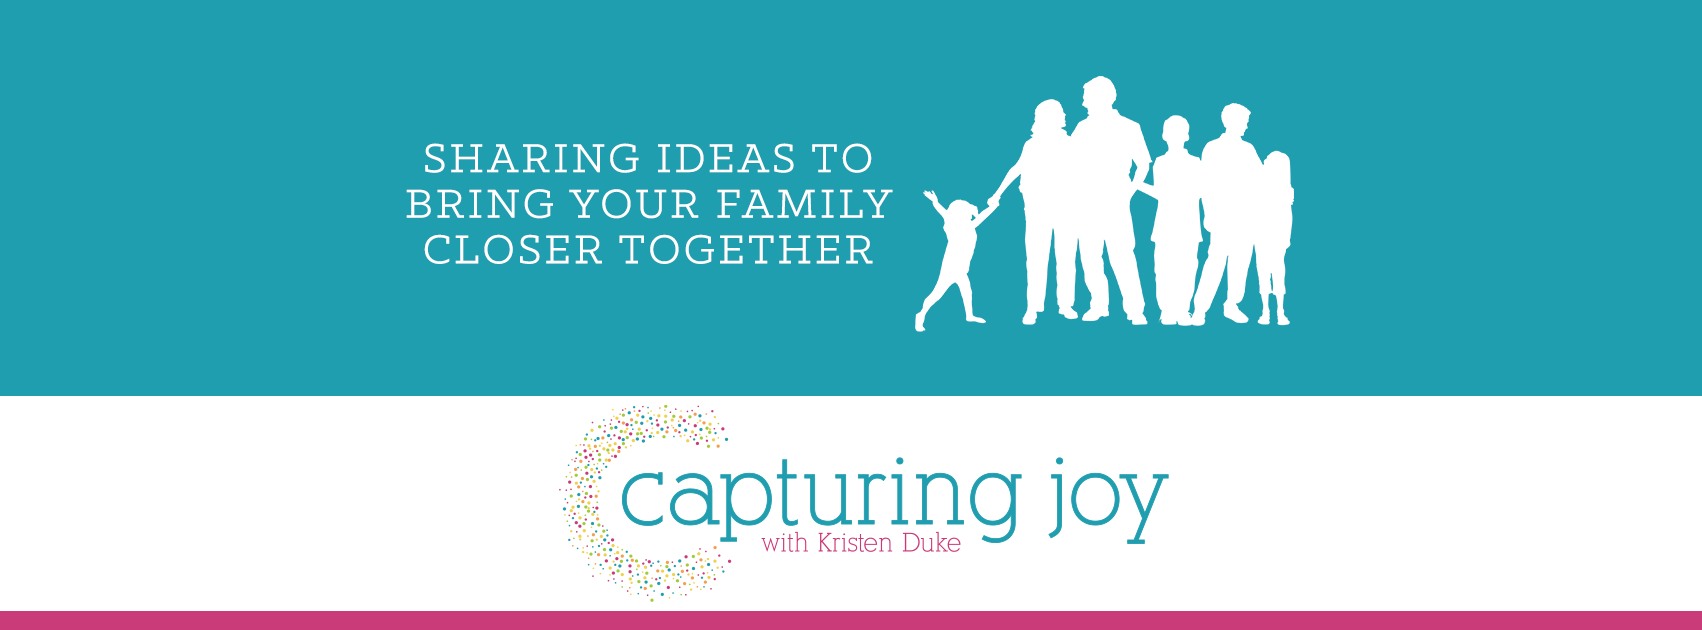 capturing joy.png